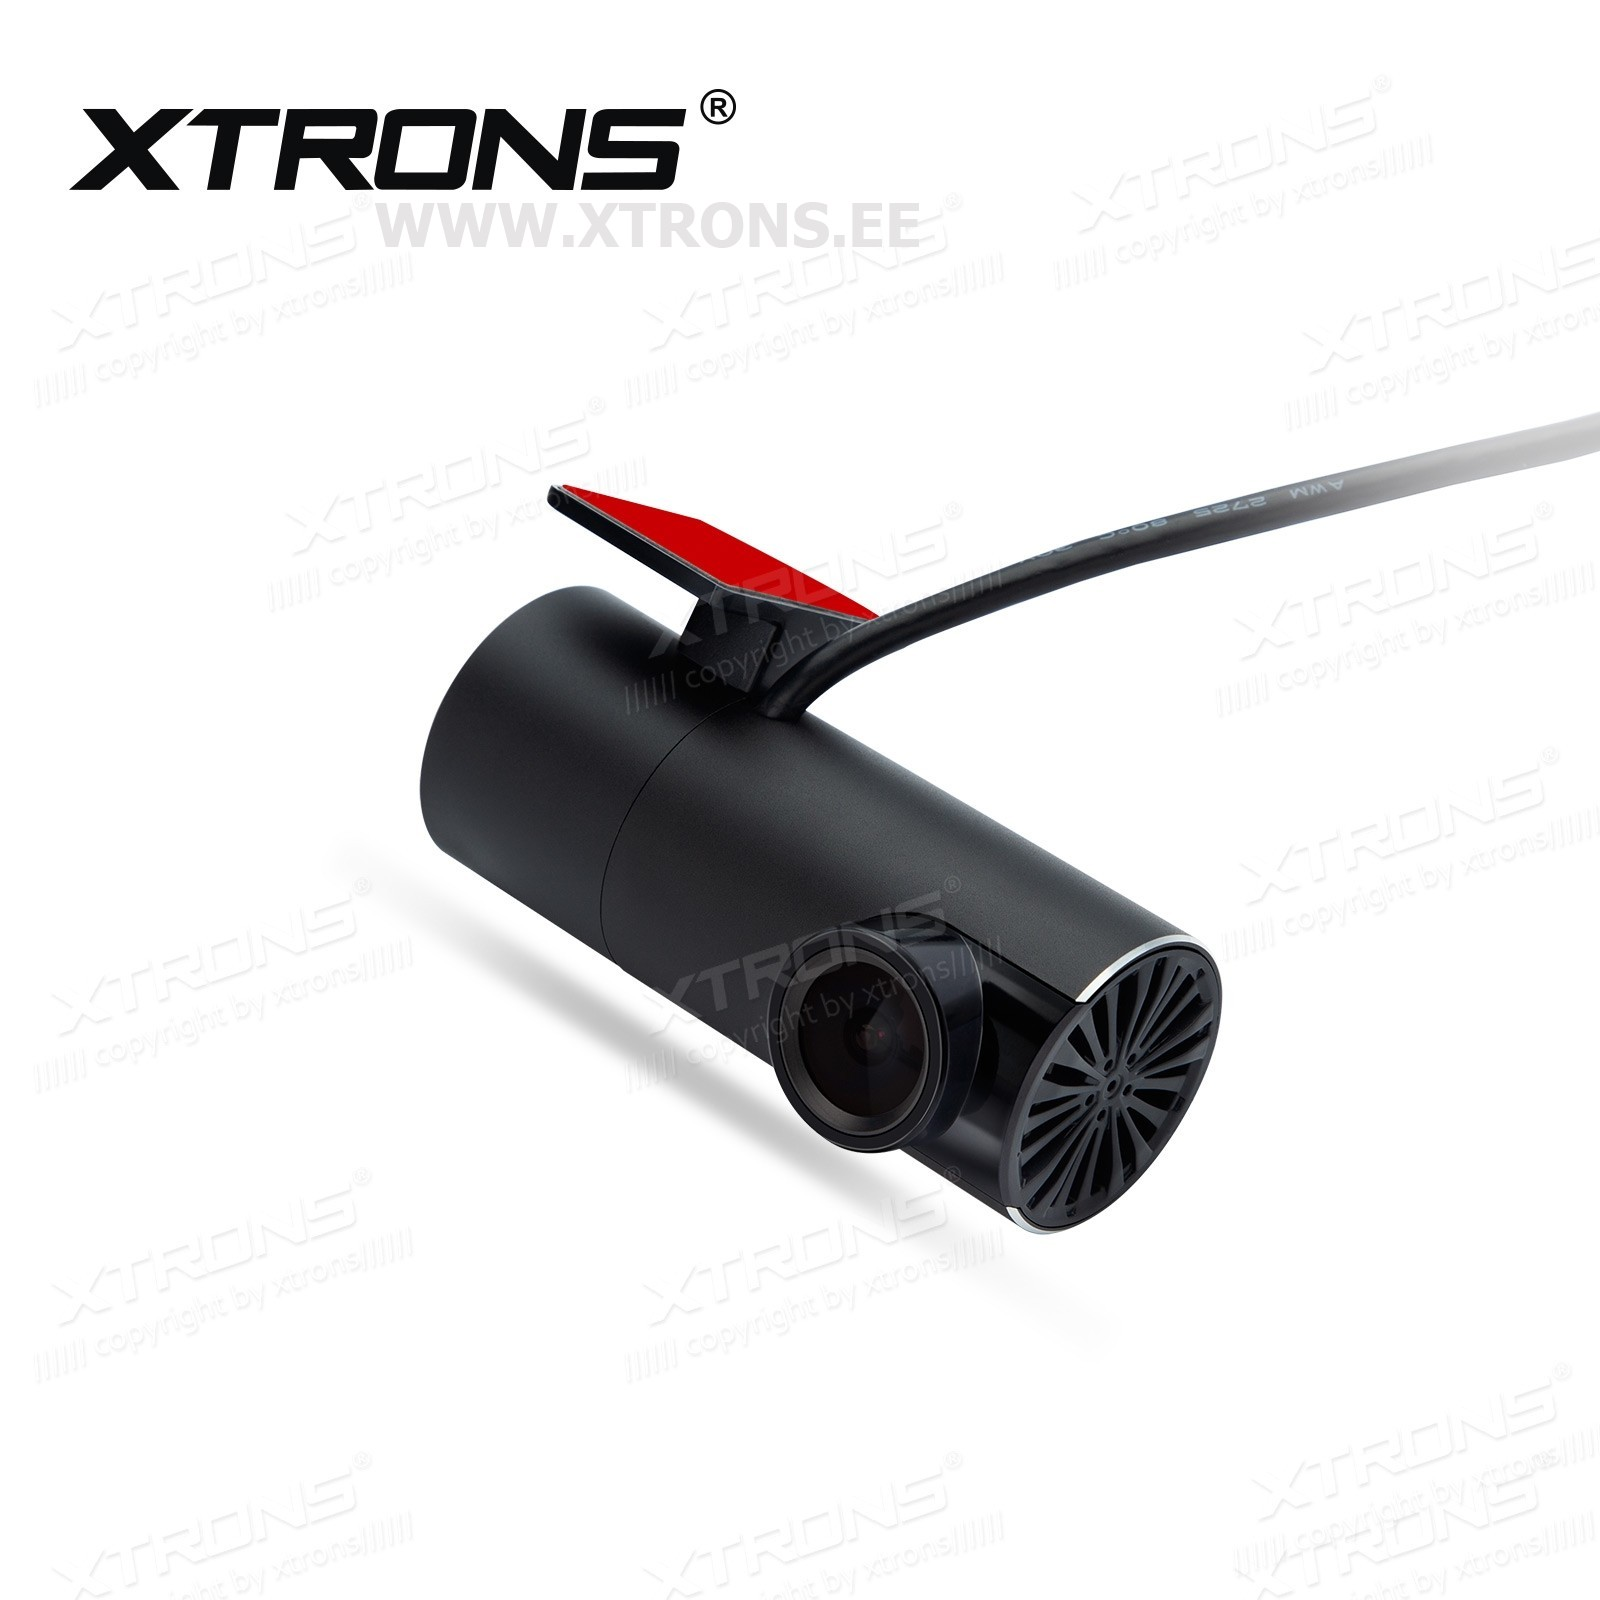 XTRONS DVR023S